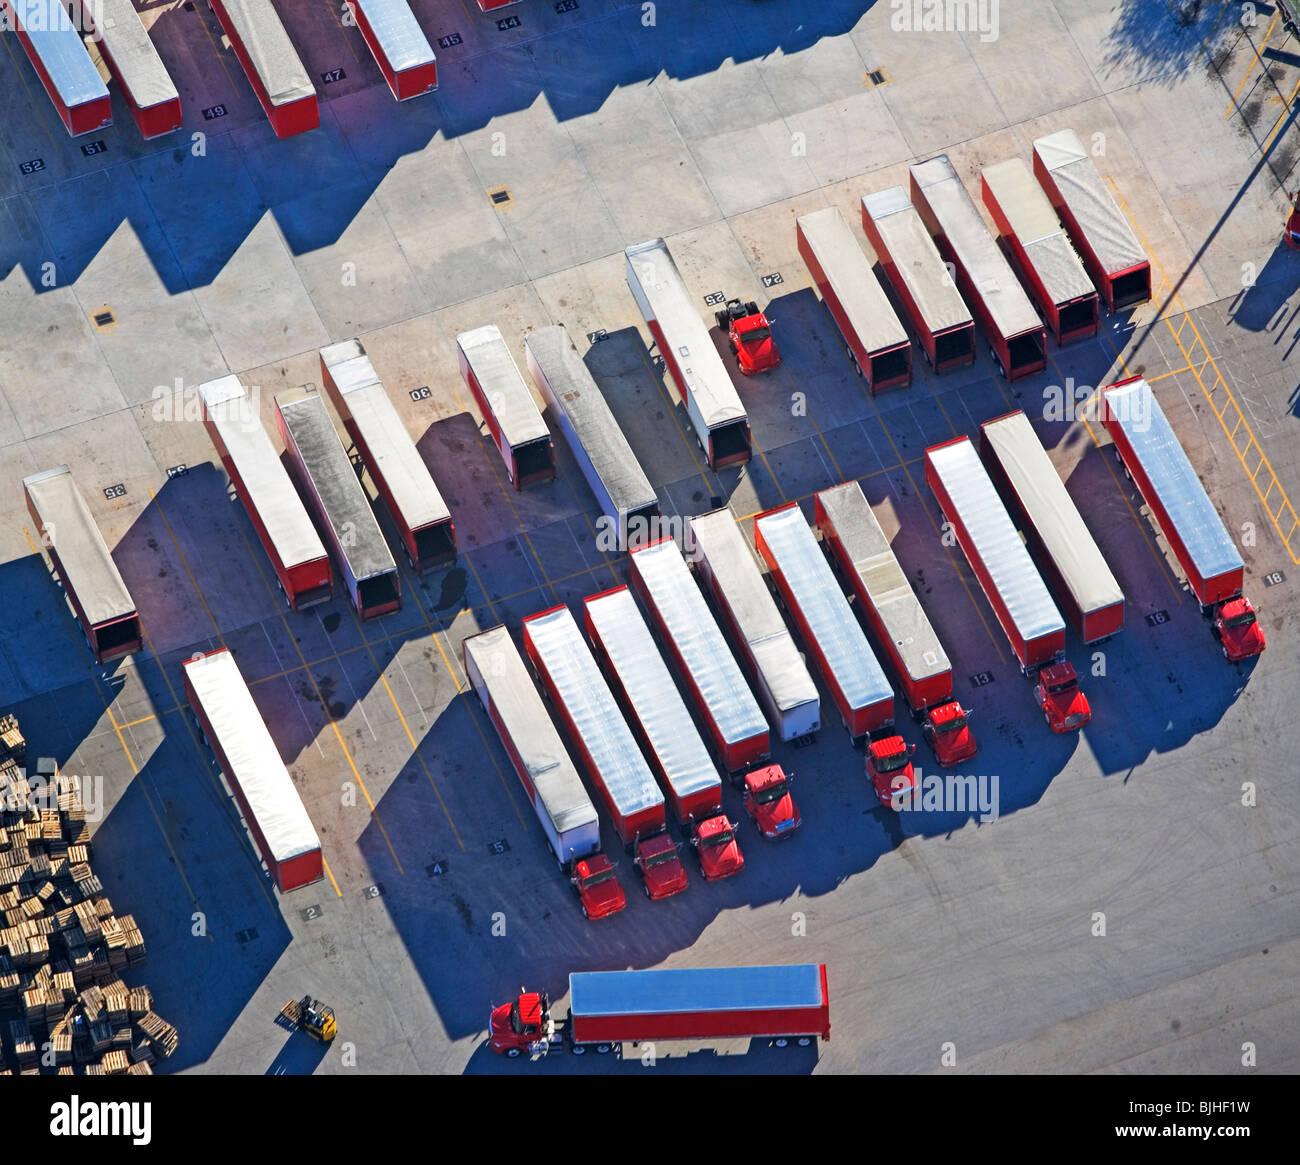 Freight trucks - Stock Image